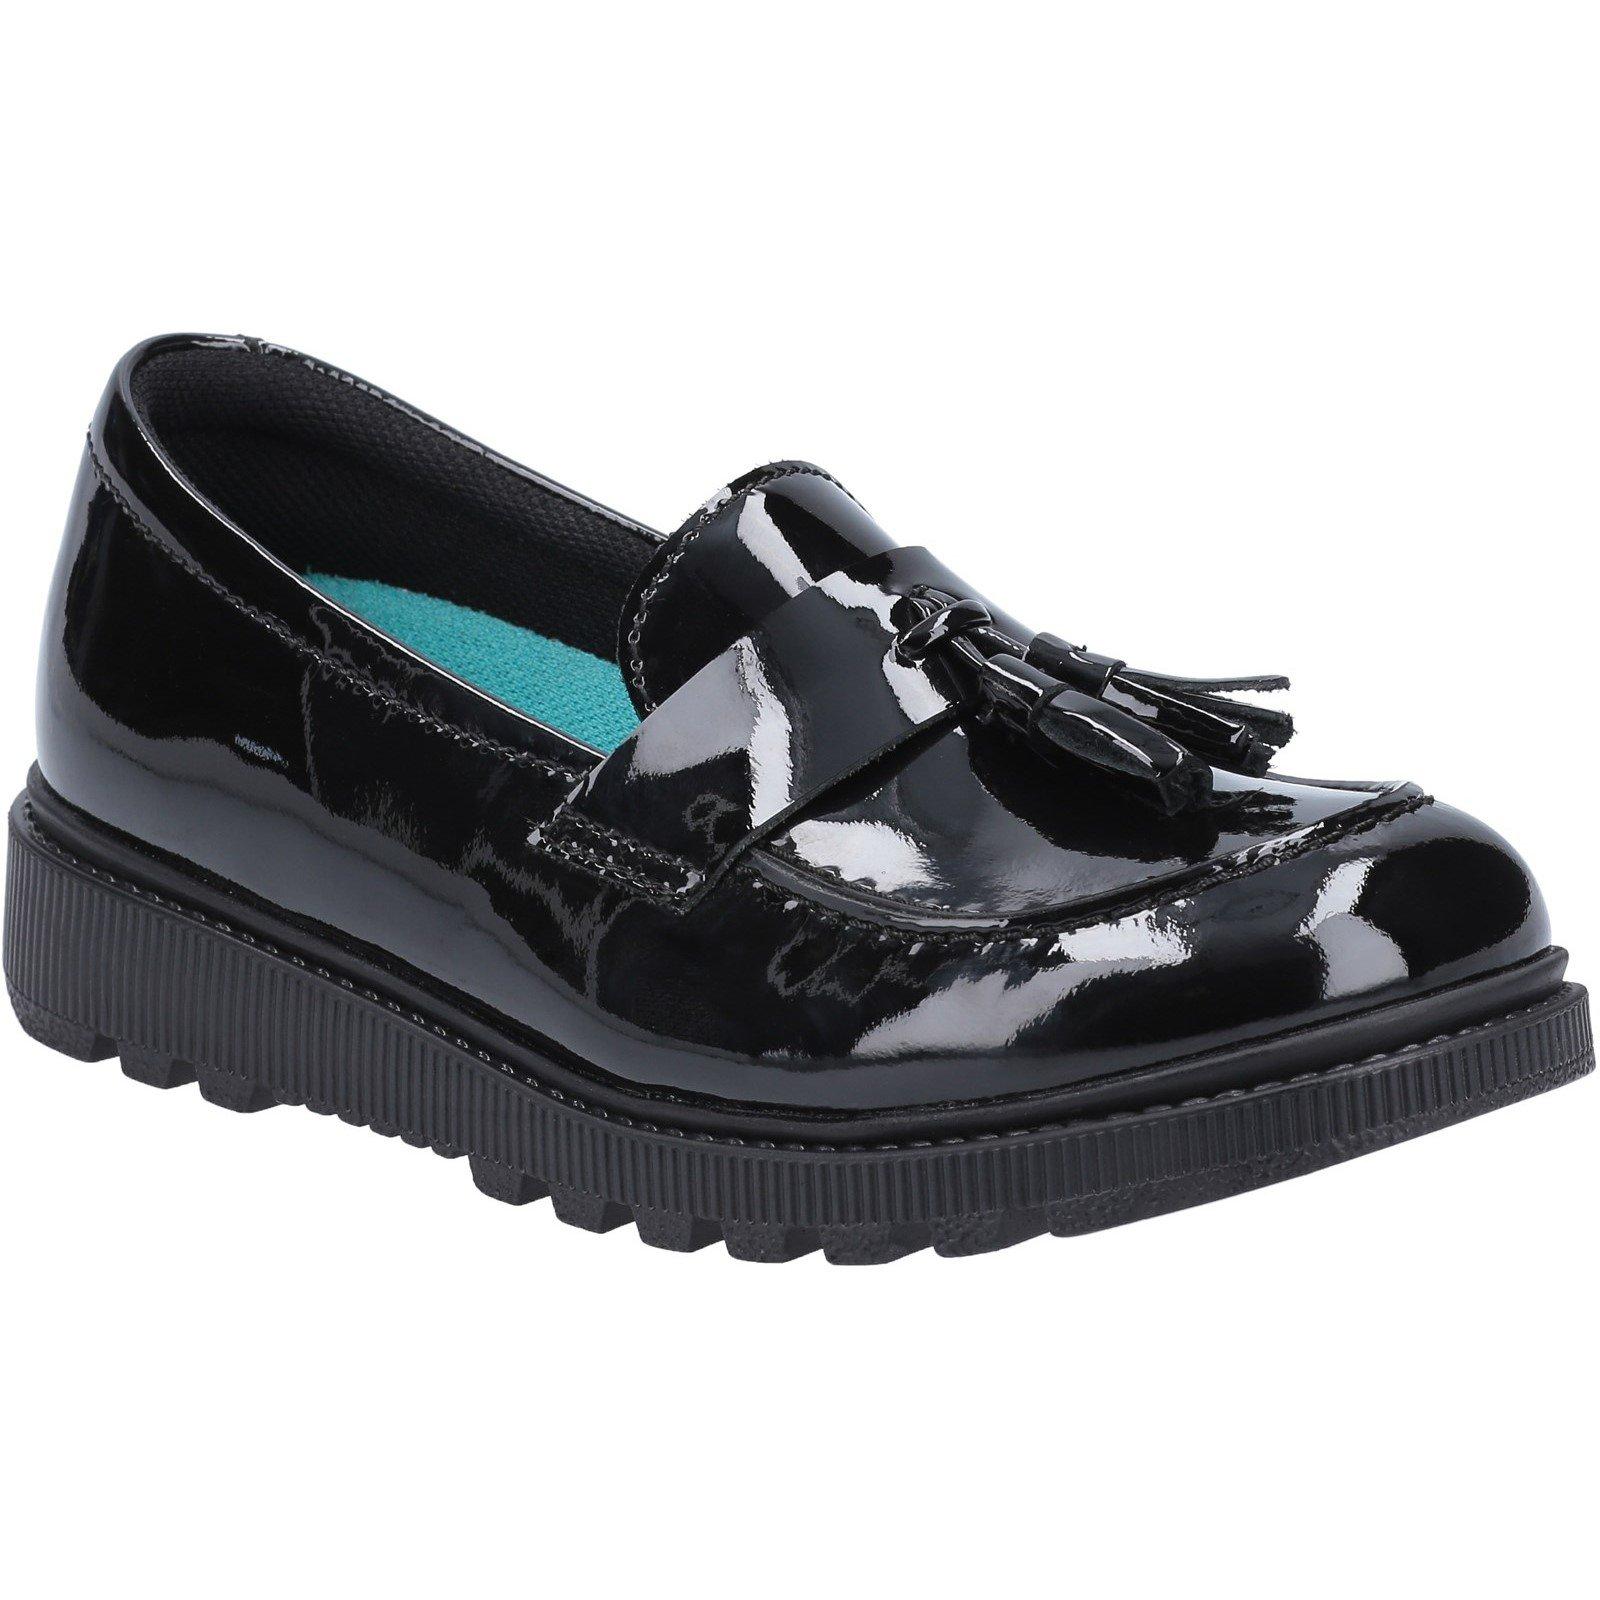 Hush Puppies Kid's Karen Junior School Shoe Patent Black 30827 - Patent Black 1